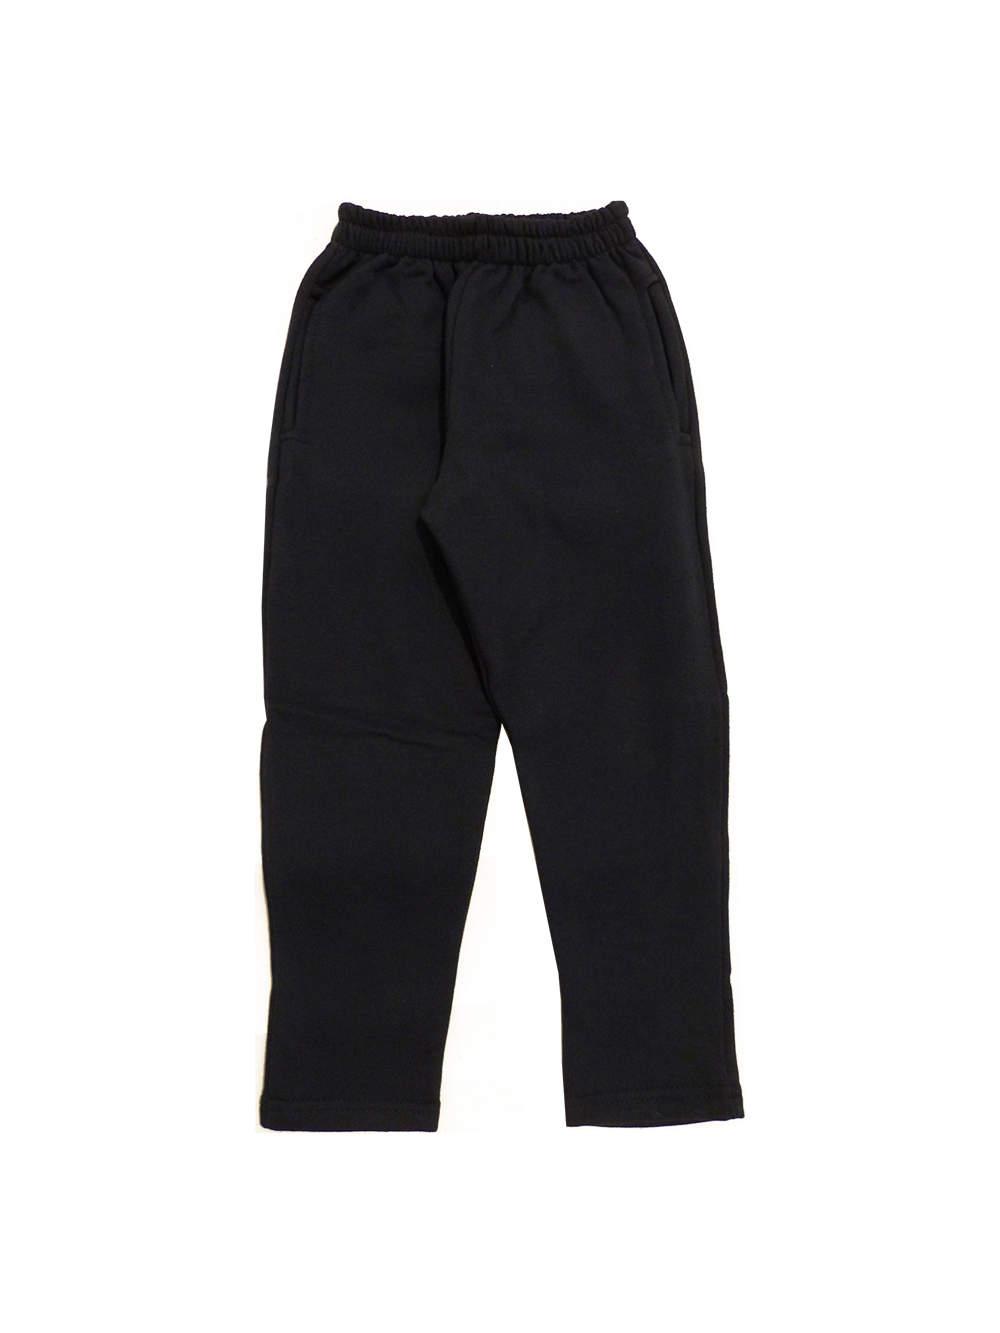 Imagen producto Pantalon nene frisa 29